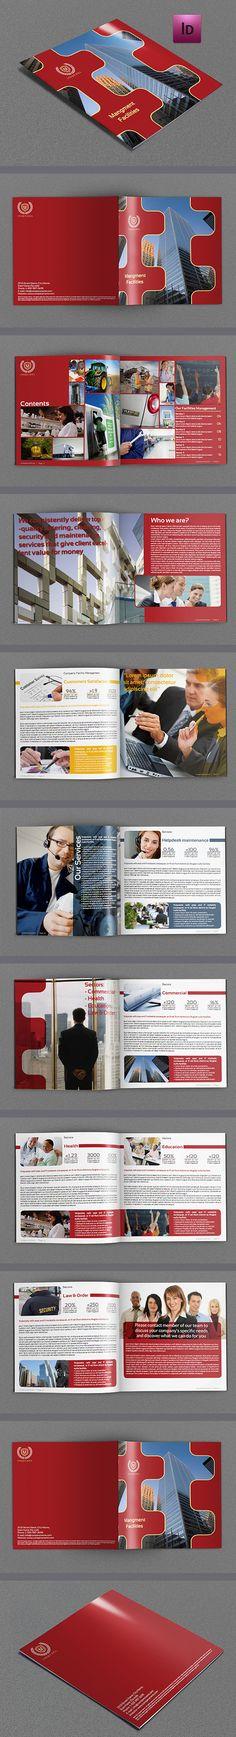 Corporate Brochure Template  #brochuredesign #corporatebrochure #graphicdesign